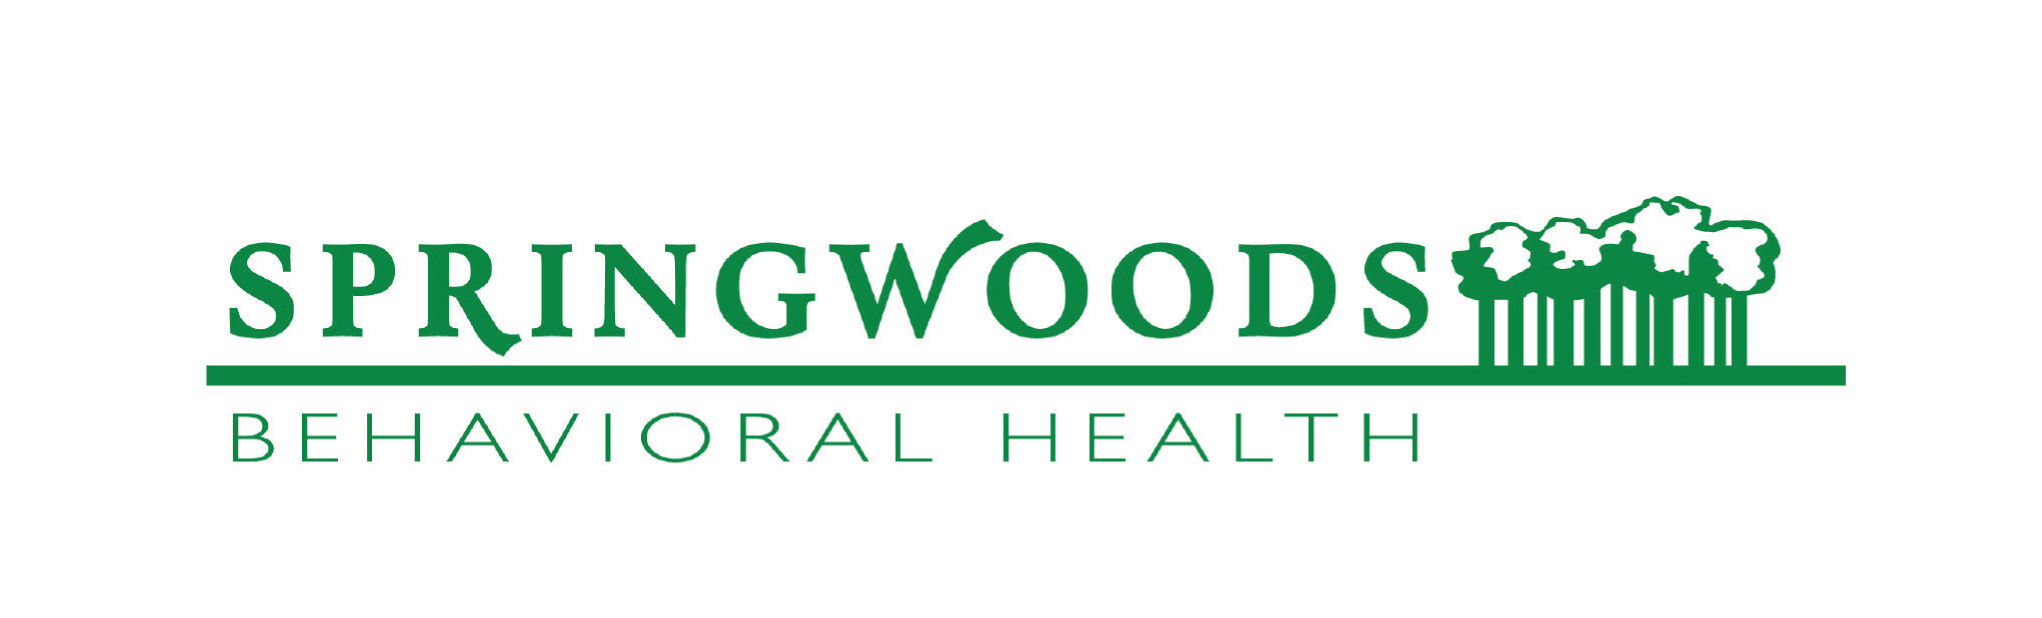 Springwoods.jpg